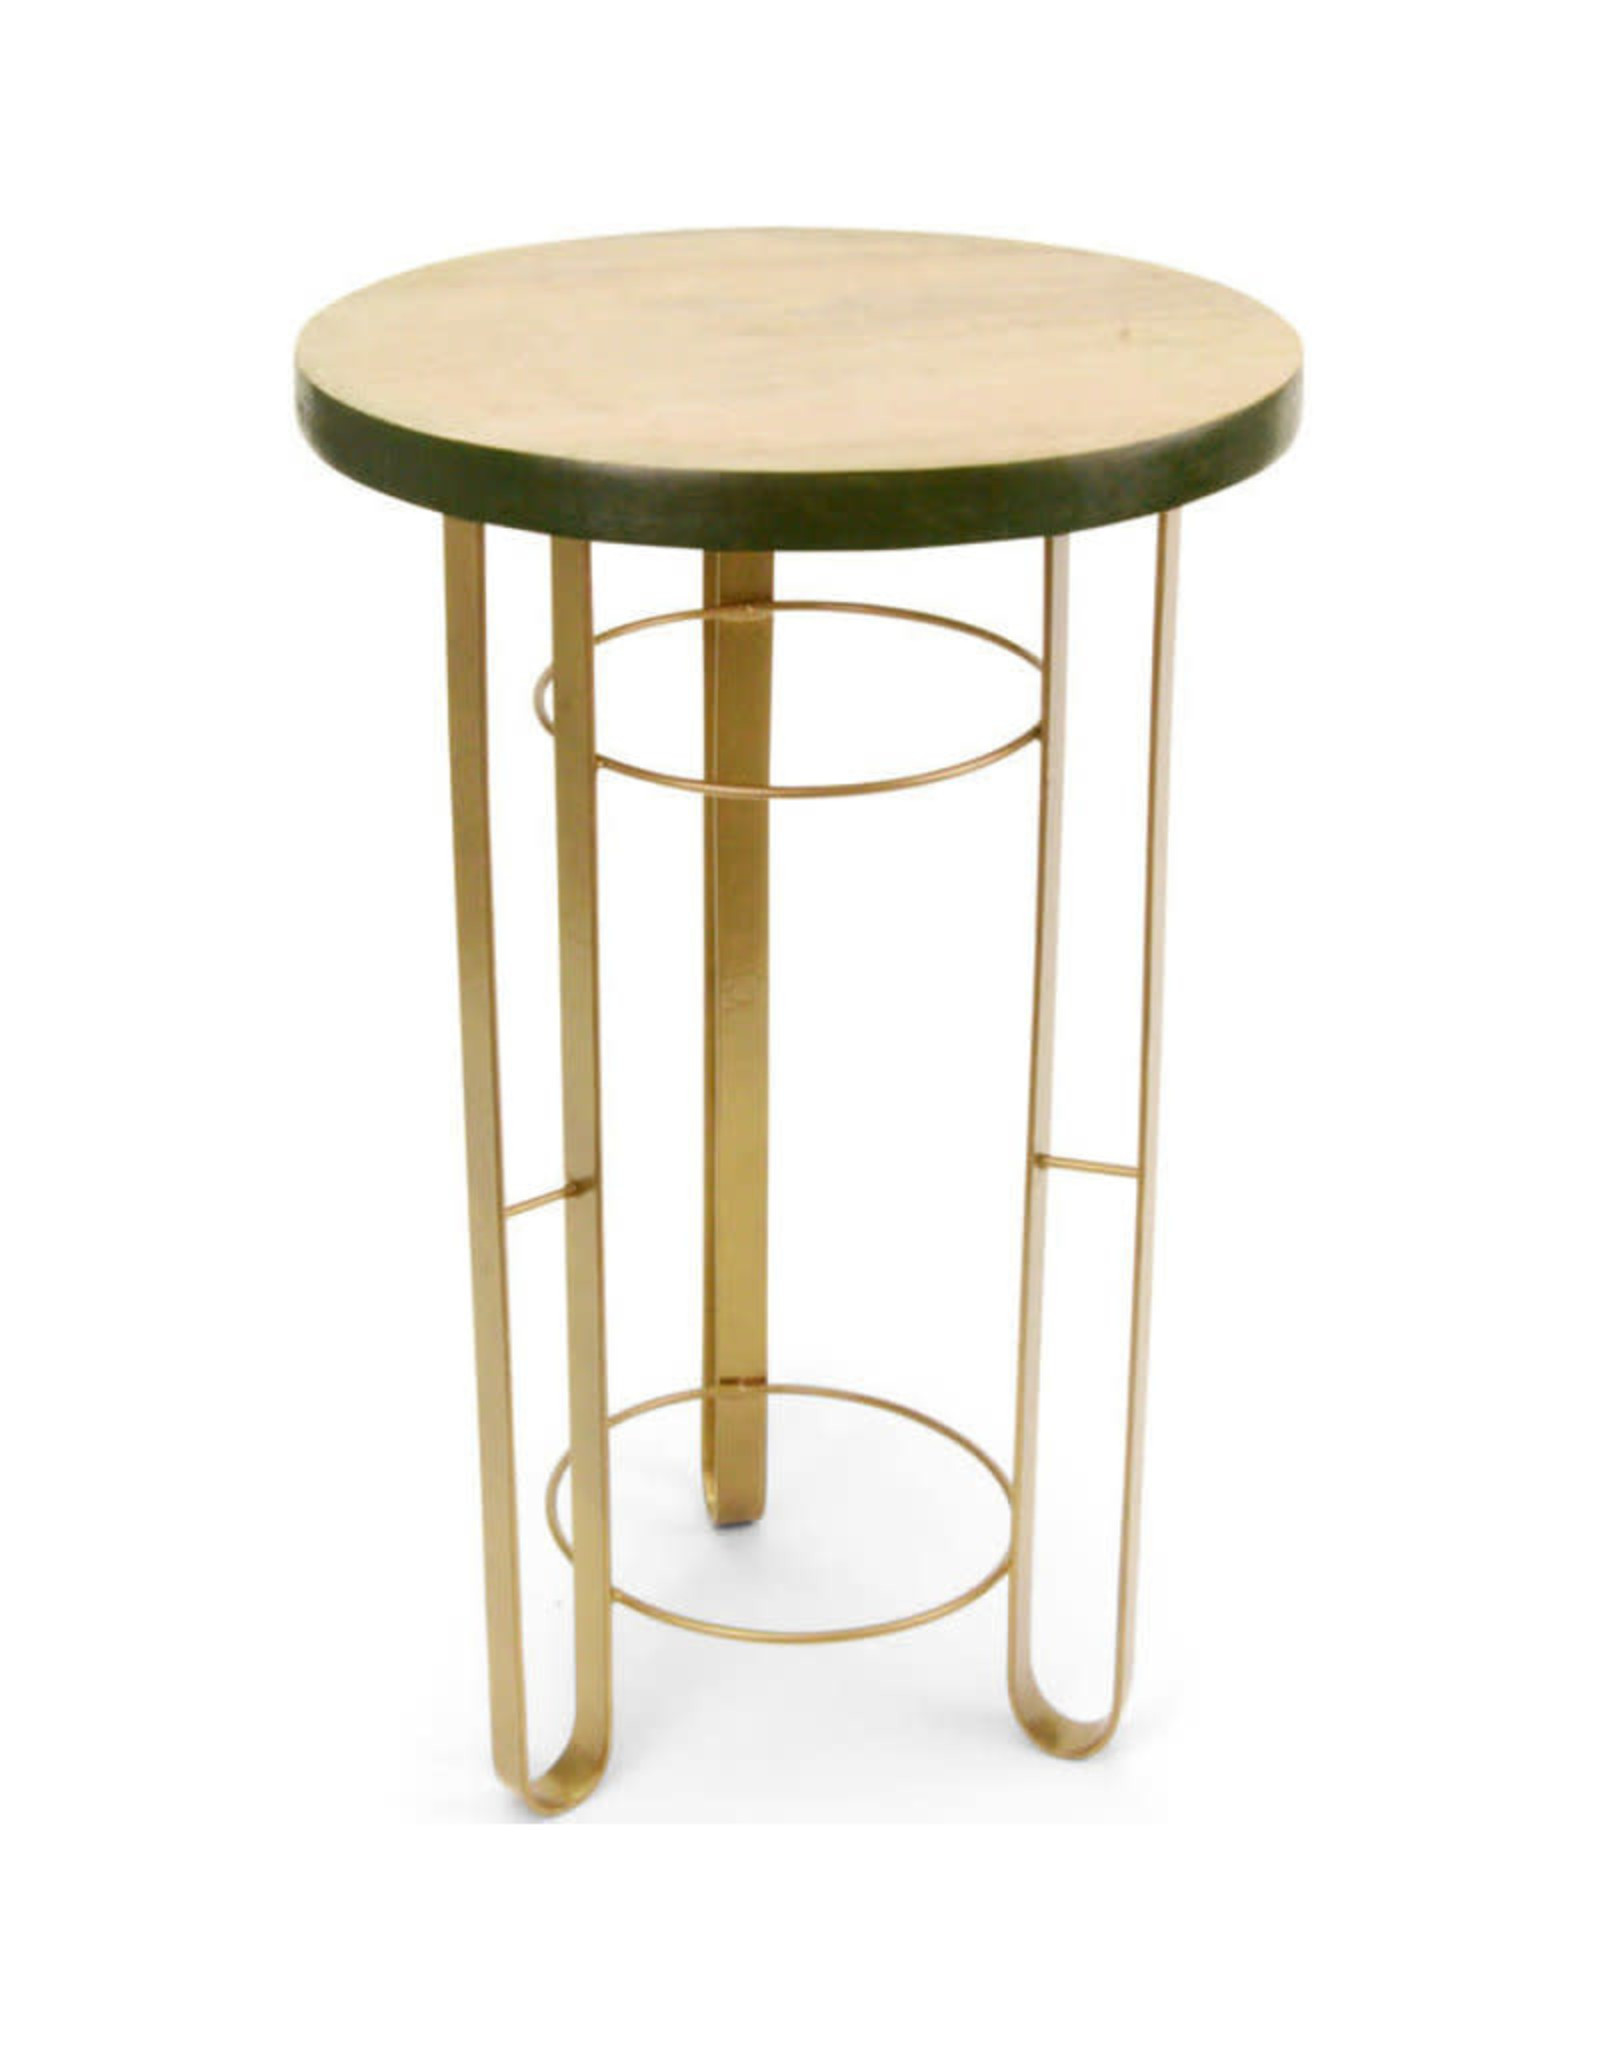 Noah's Ark Table Round 3 Leg Wood/Metal